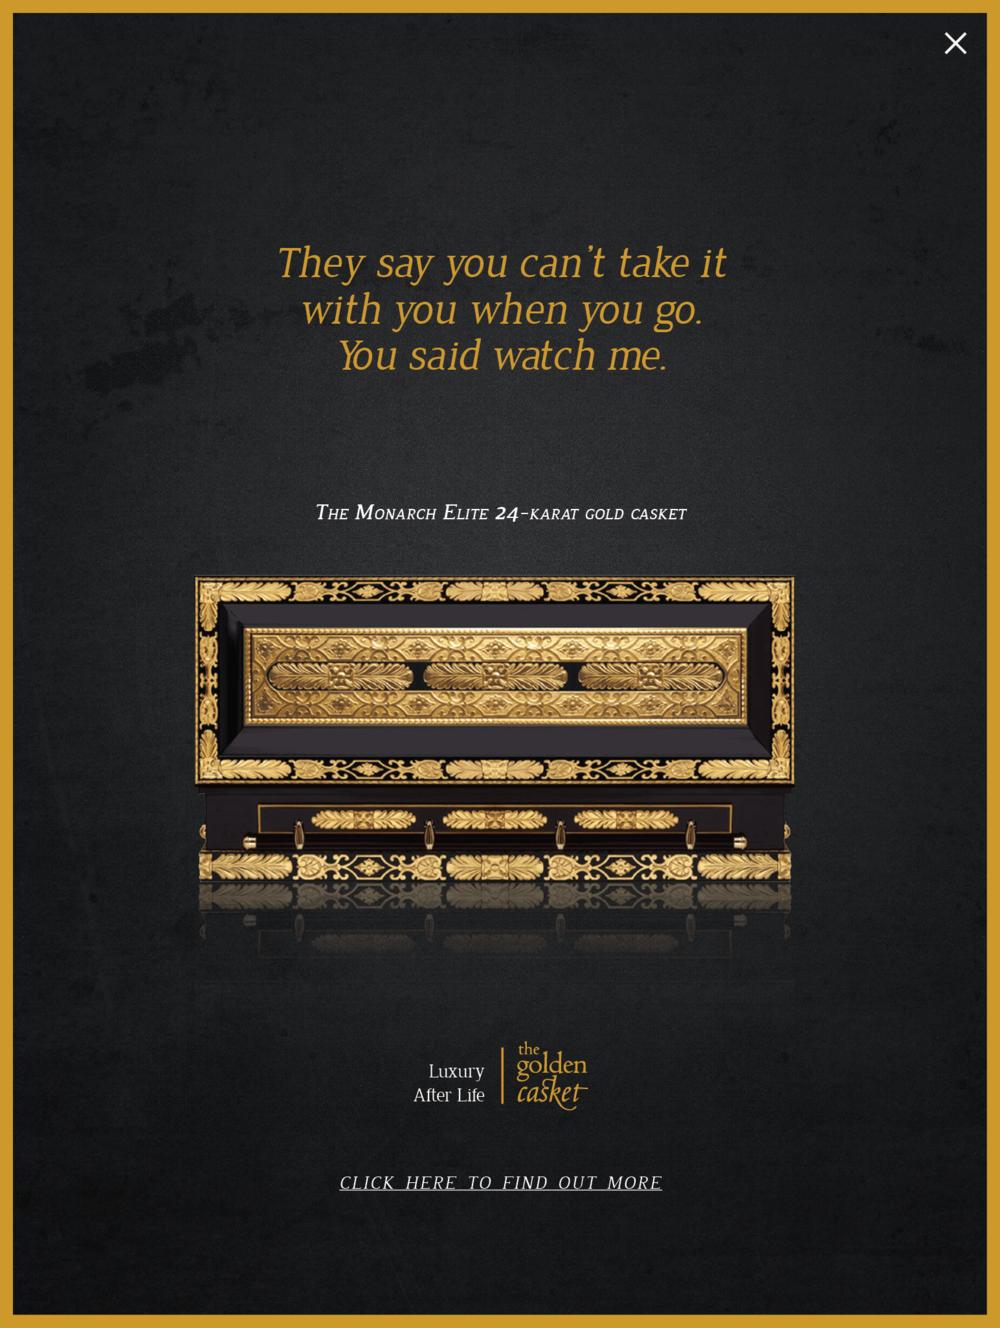 Updated Golden Casket Banner 3-04.png